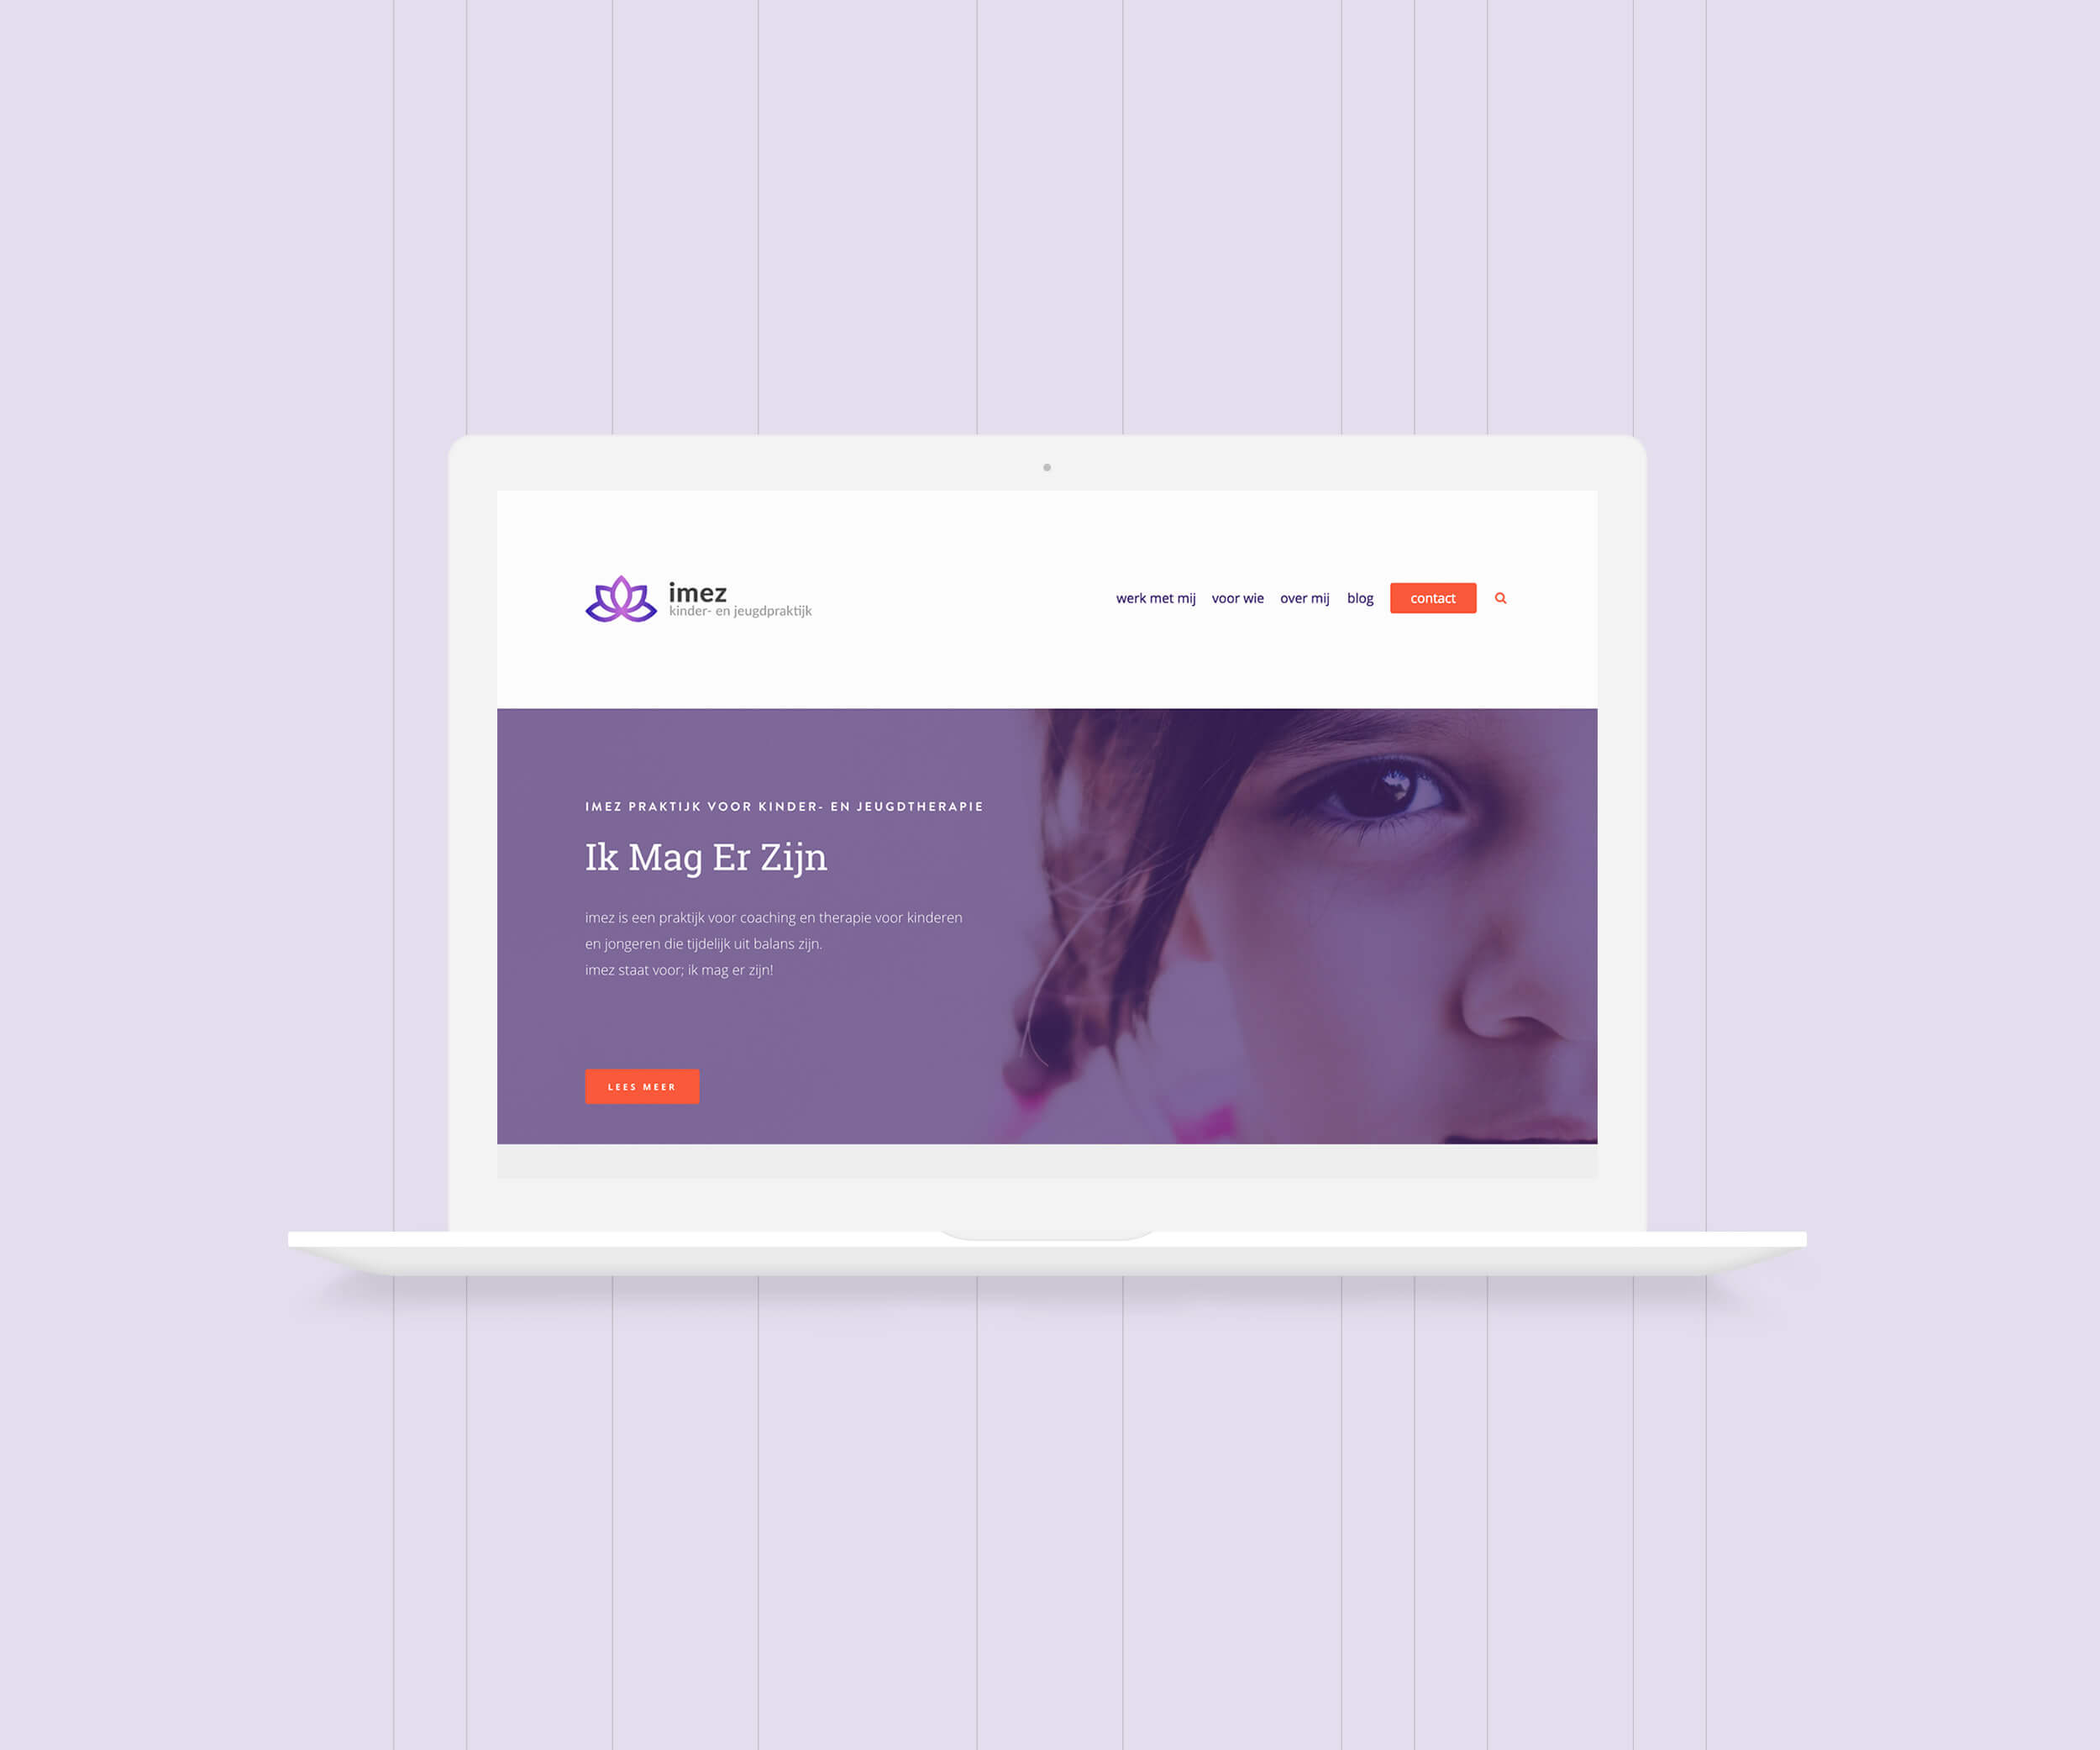 imez_homepage.jpg